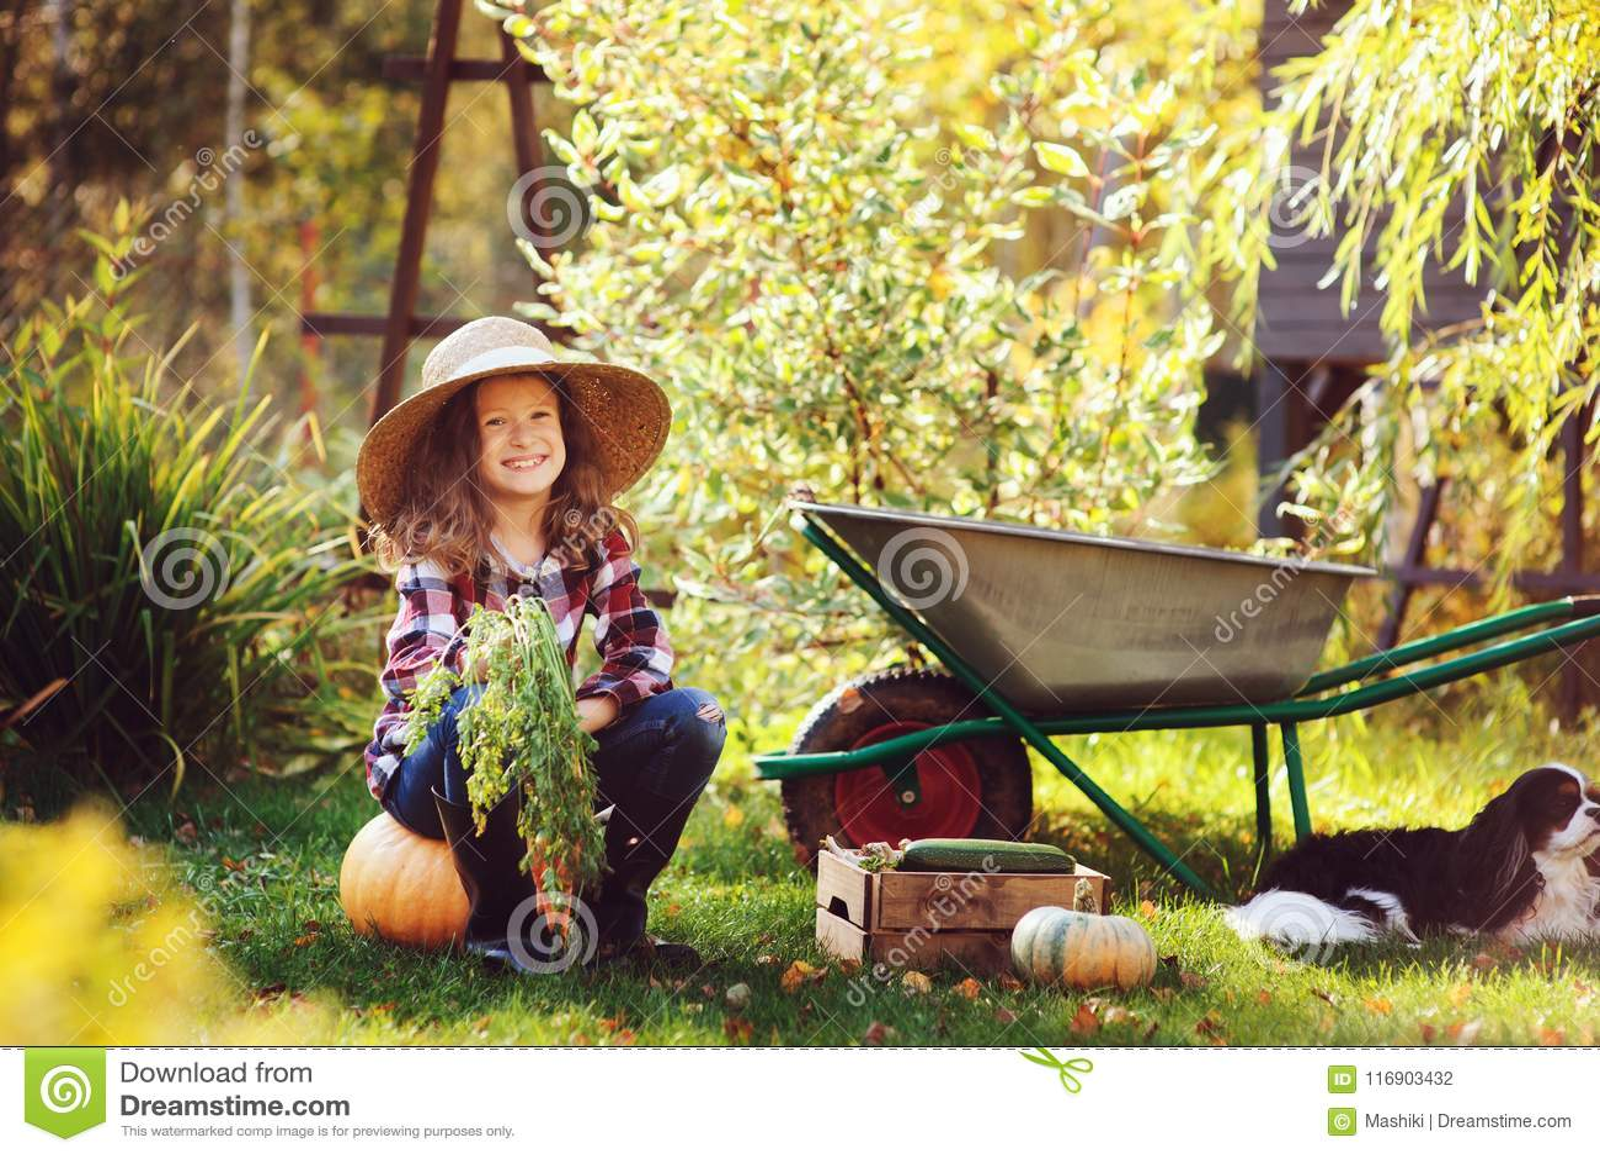 Happy child girl with spaniel dog playing little farmer in autumn garden